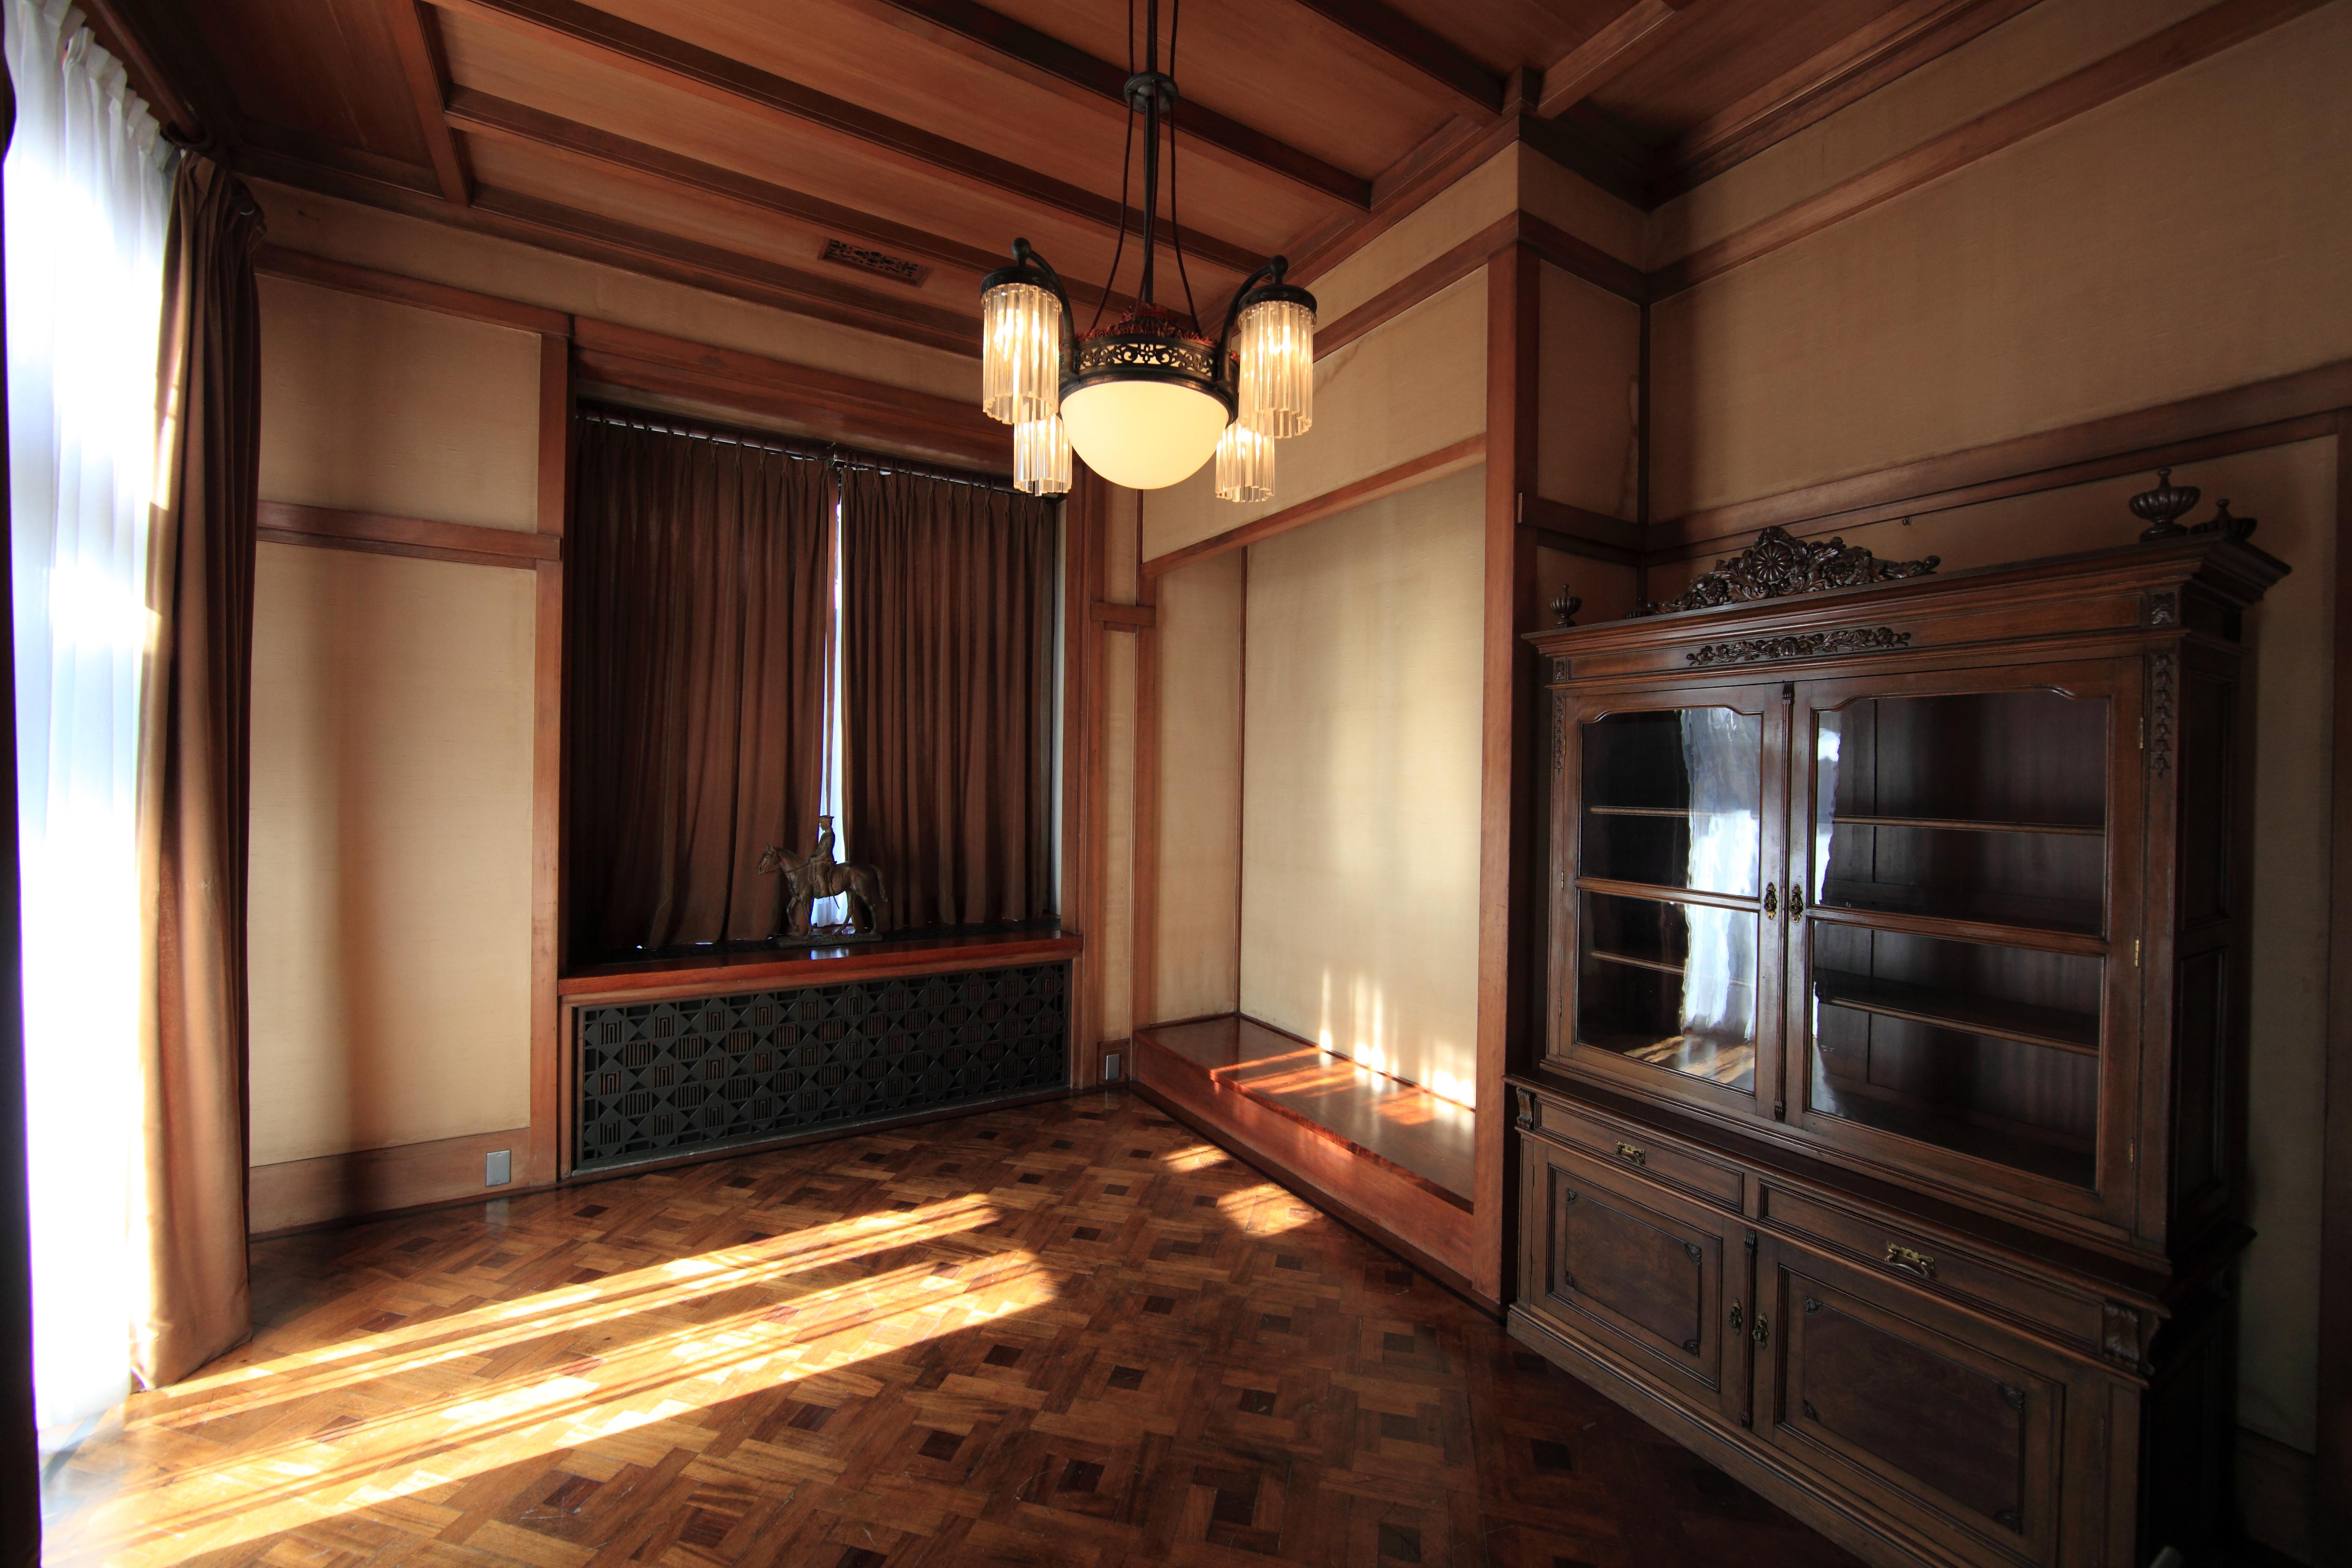 Fotos gratis : palacio, piso, interior, techo, alto, museo, cabaña ...